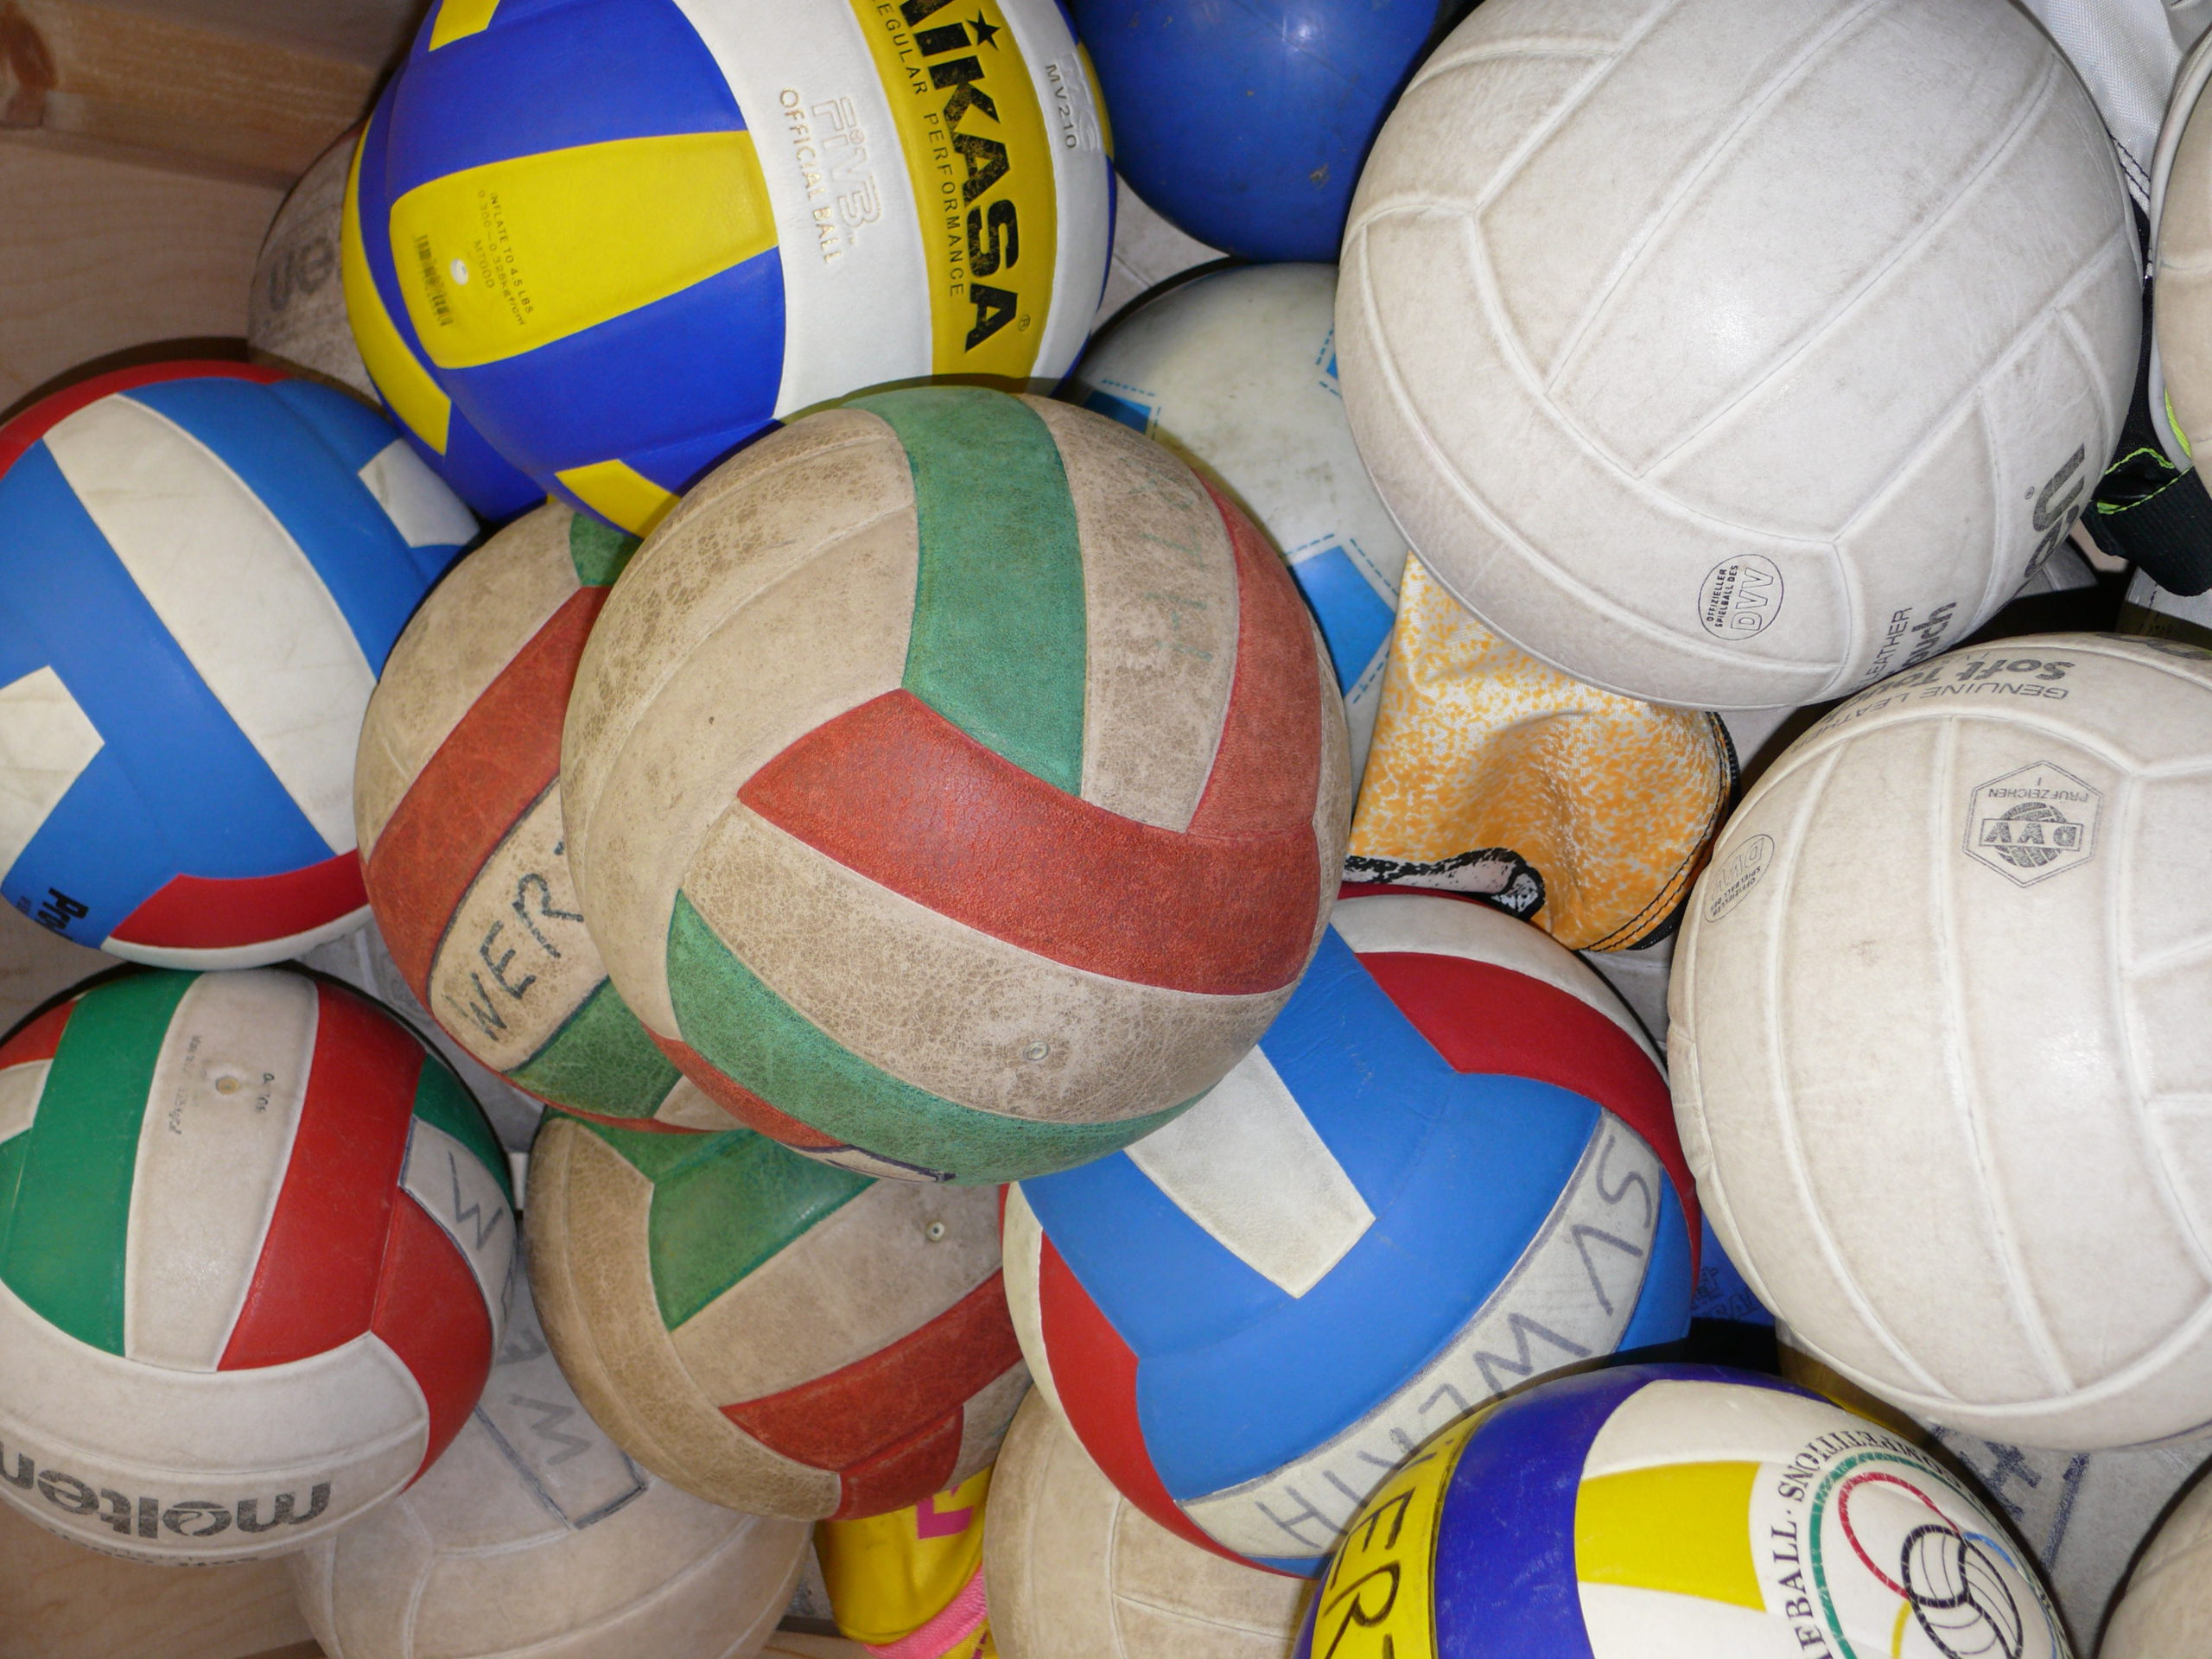 Fußball-Handball-Volleyball - Ergebnisse